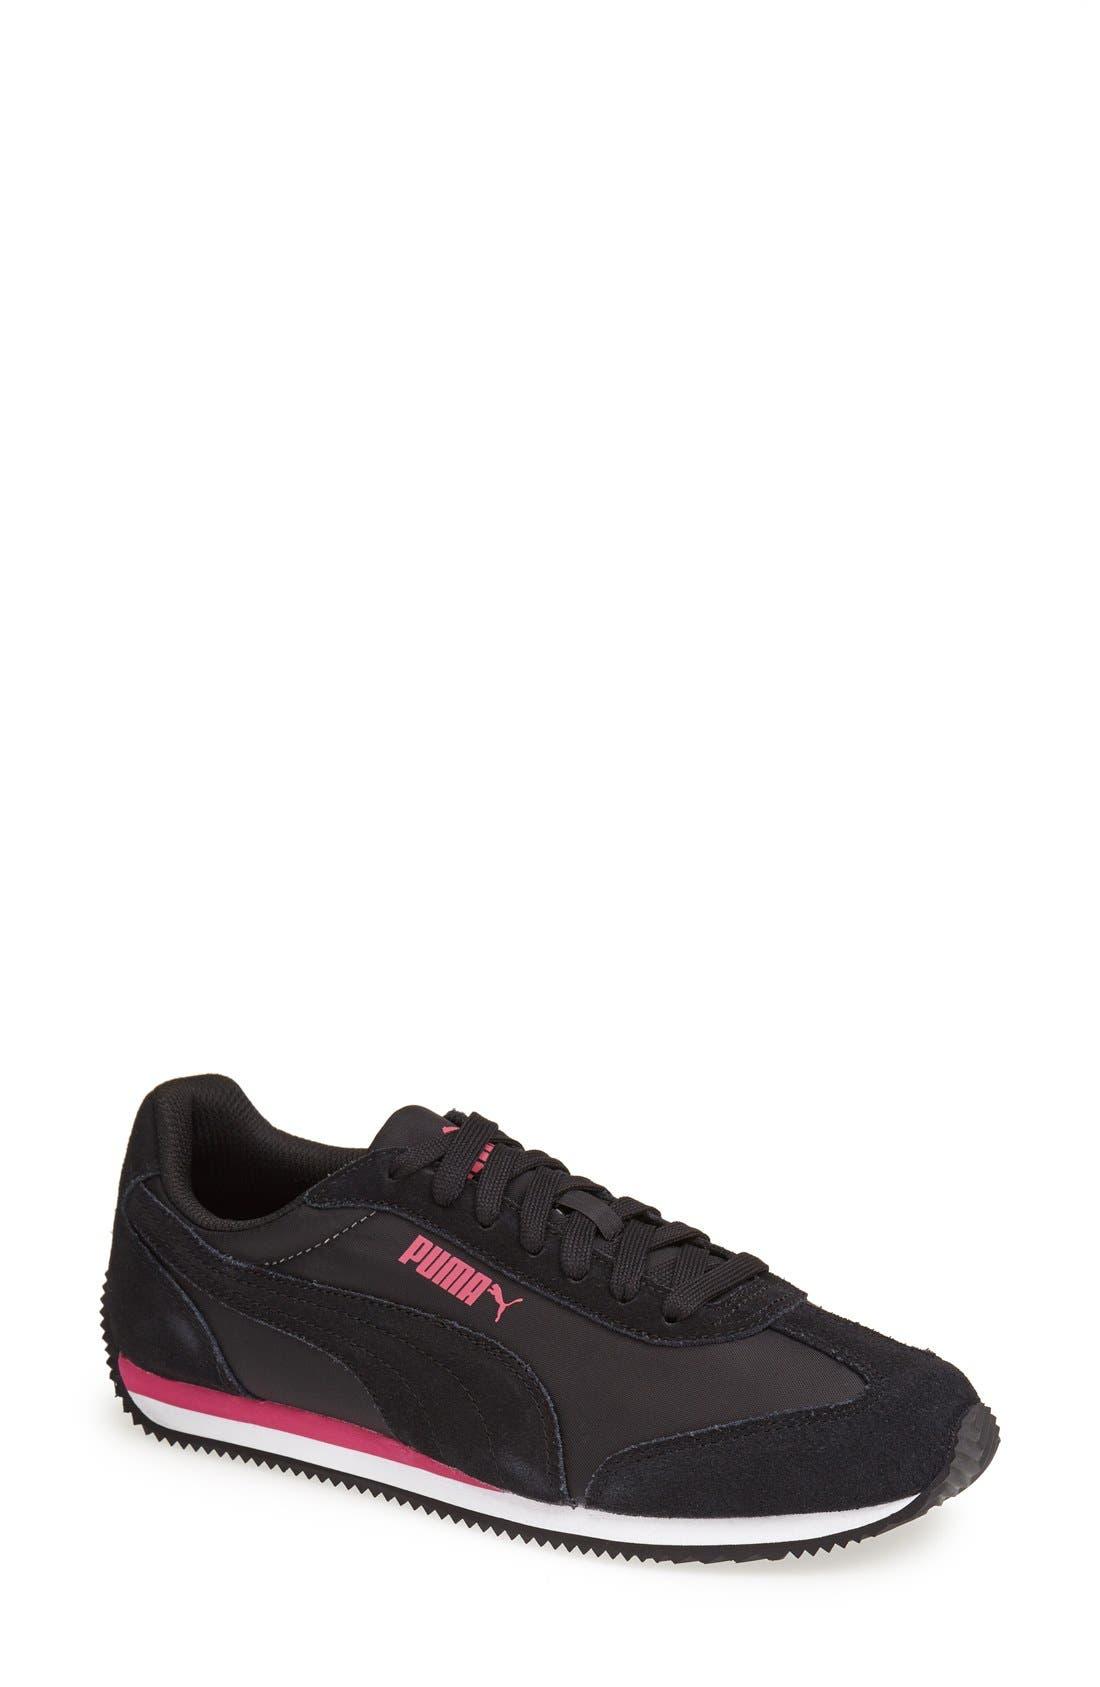 Alternate Image 1 Selected - PUMA 'Rio Speed NL' Sneaker (Women)